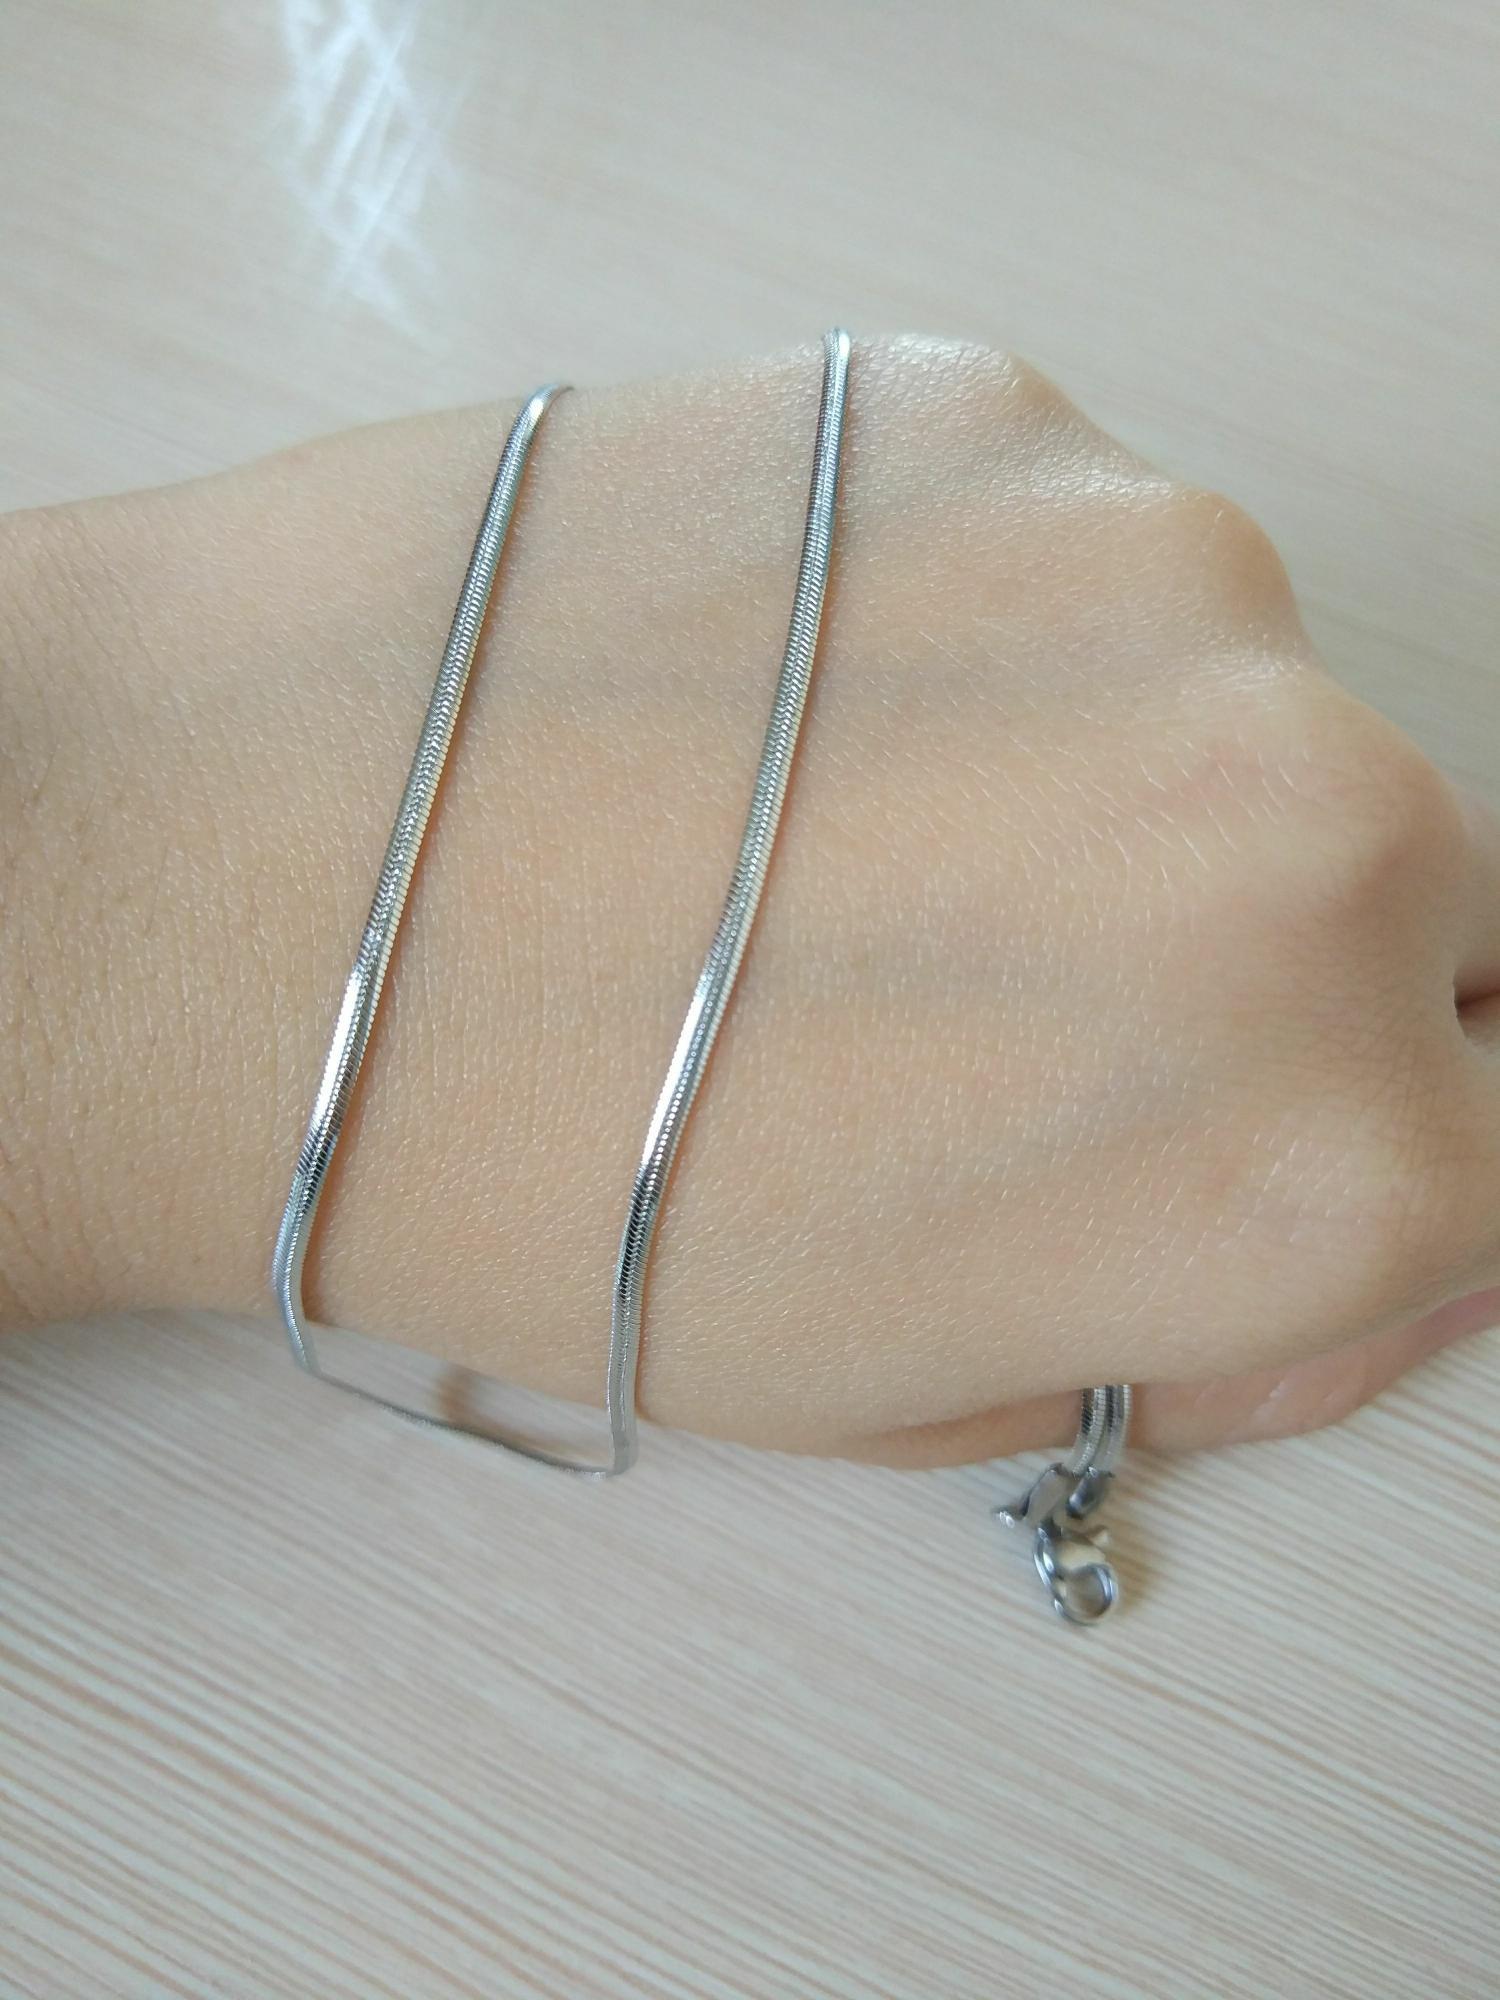 Kalung Single Wanita Titanium Kls009 Daftar Harga Terkini dan Source · Kalung import titanium fashion pria